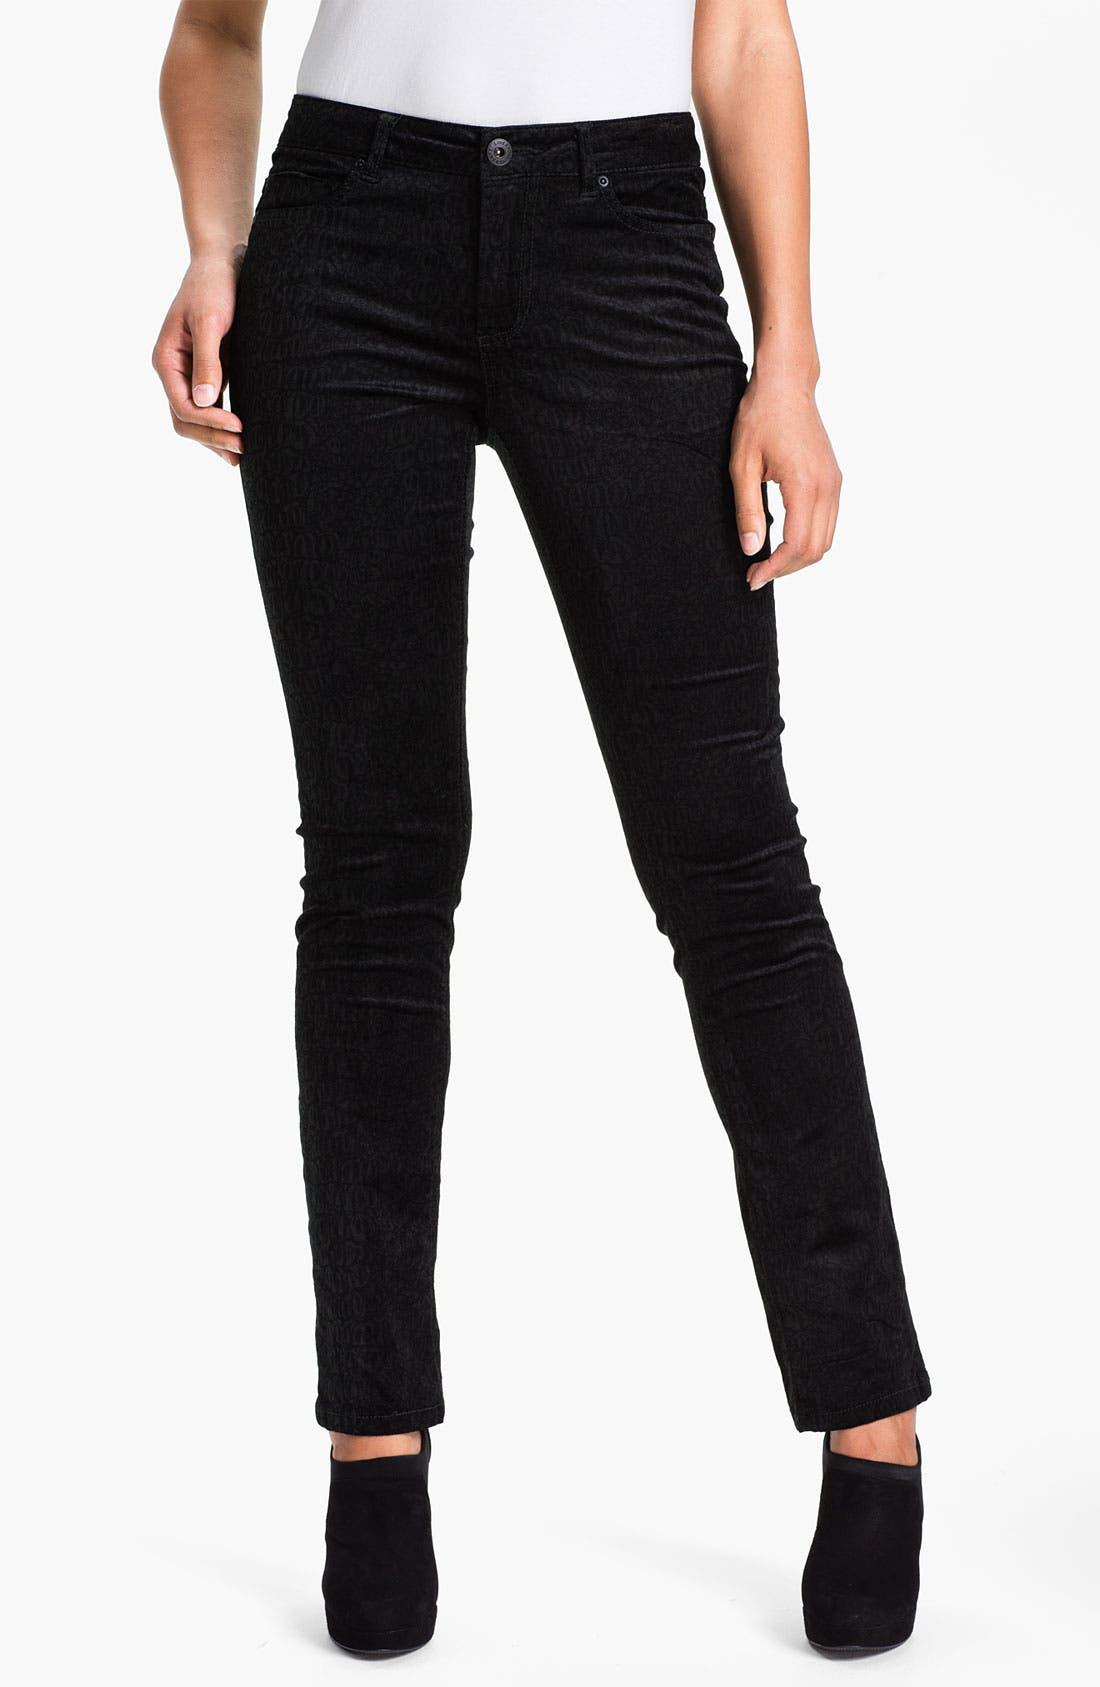 Jeans Company 'Sadie' - Cheetah' Straight Leg Velveteen Jeans,                         Main,                         color, 001